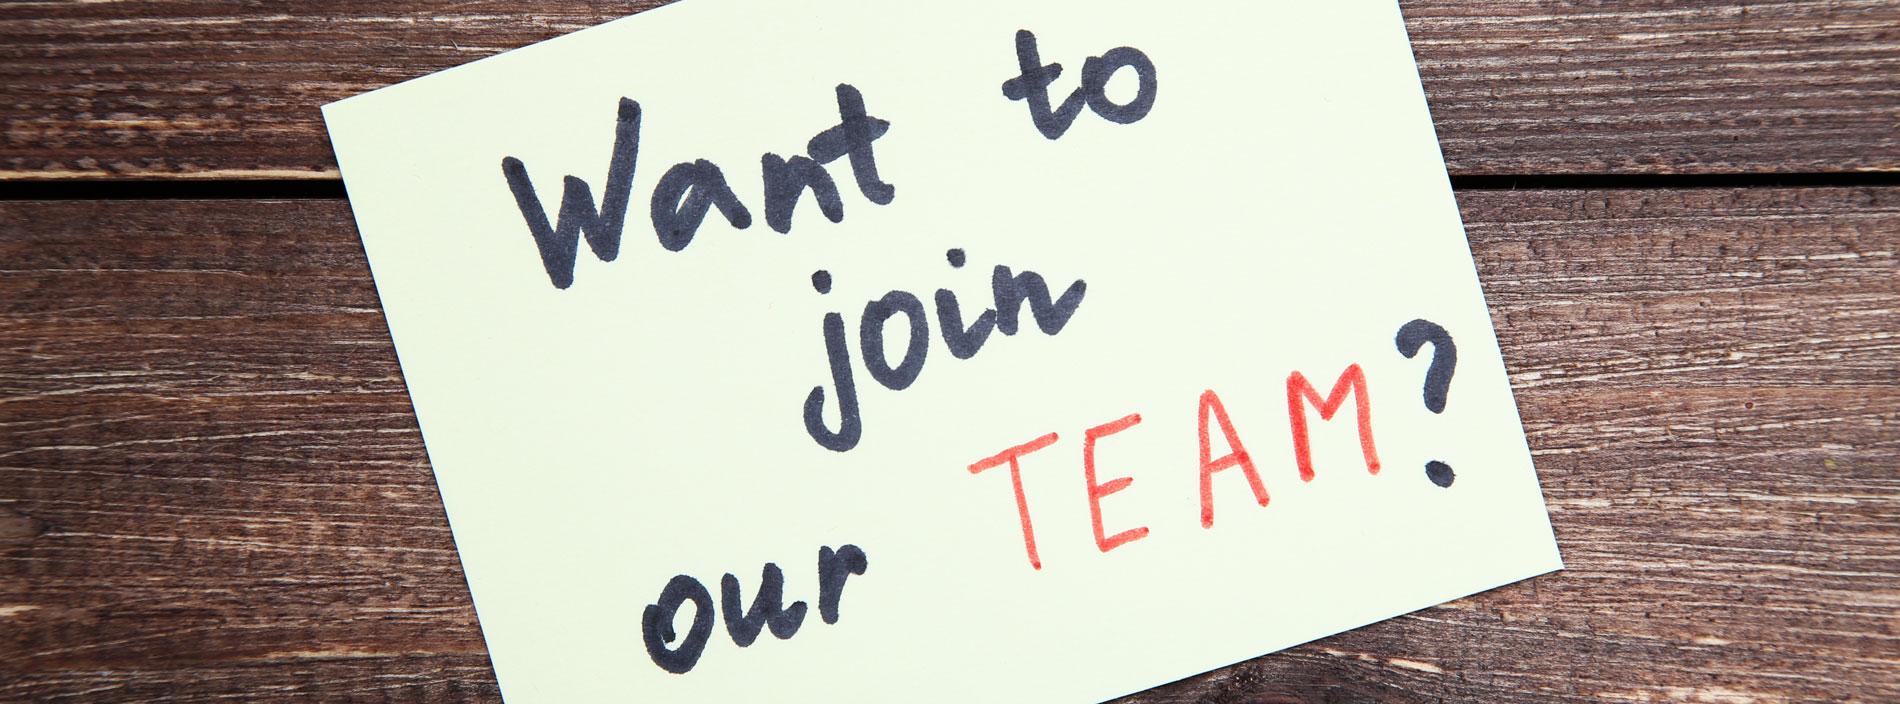 Now hiring roofing jobs in San Antonio Texas sign